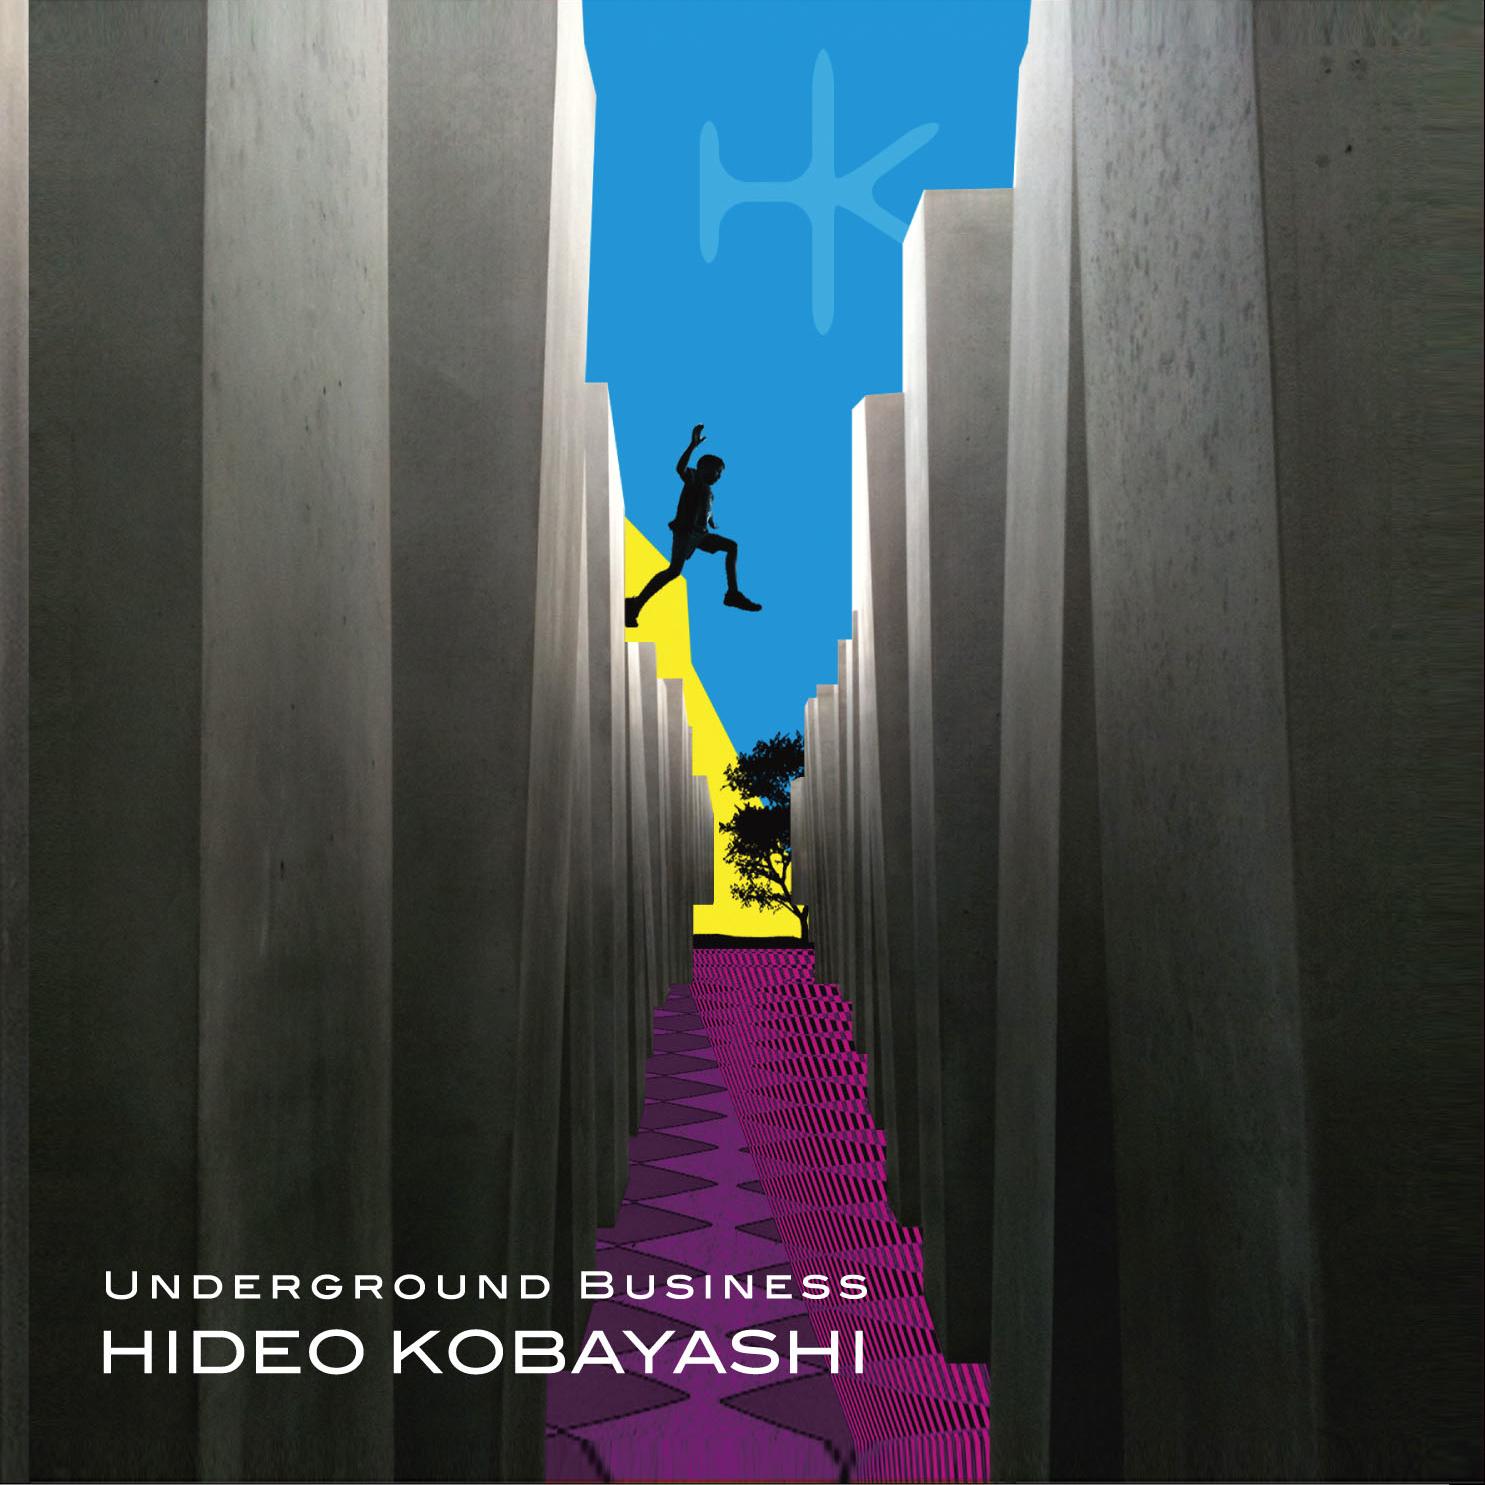 Hideo Kobayashi - Yuki